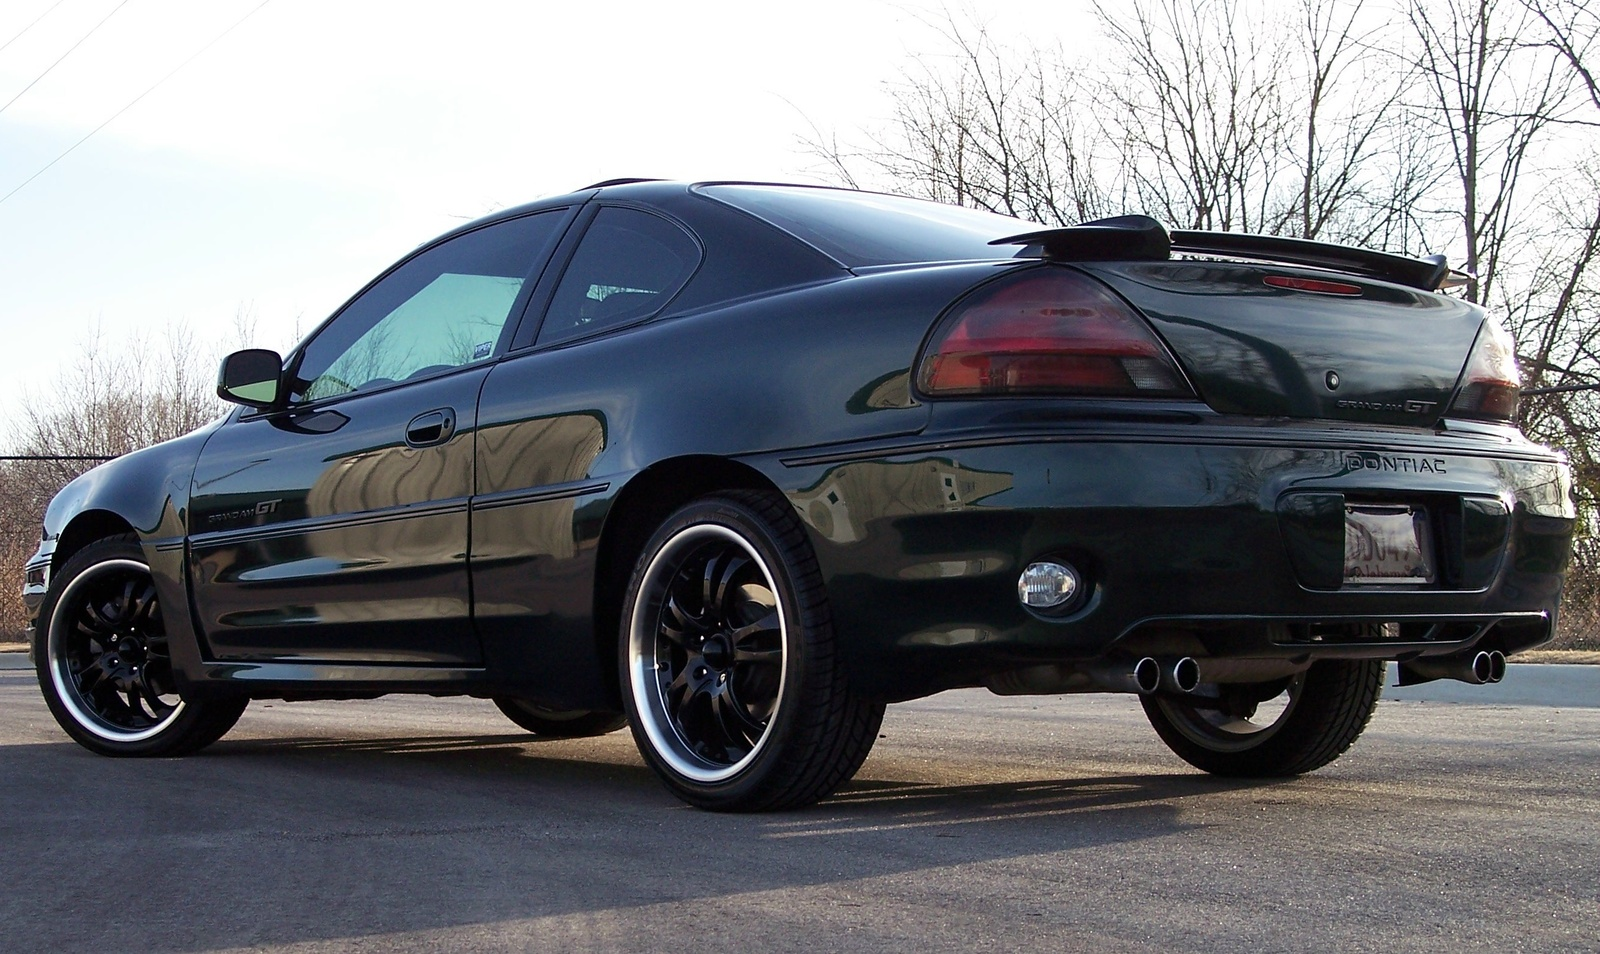 Used 1998 Pontiac Grand Prix Gt Am